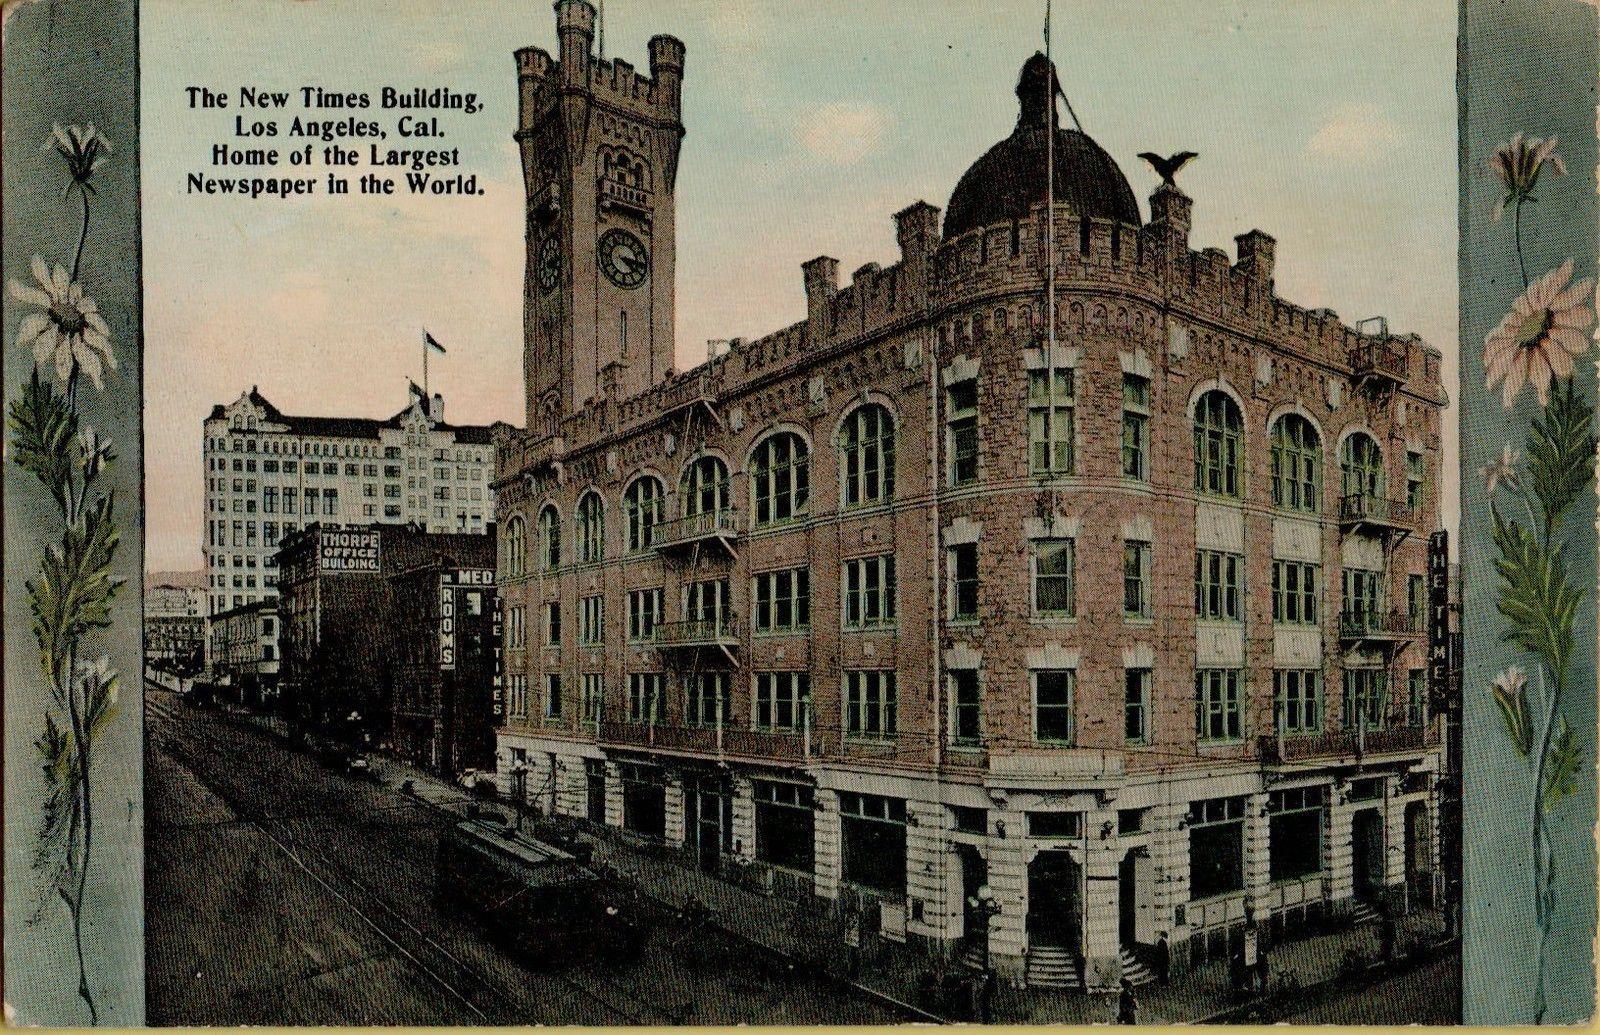 los angeles times building 1912 j h graham